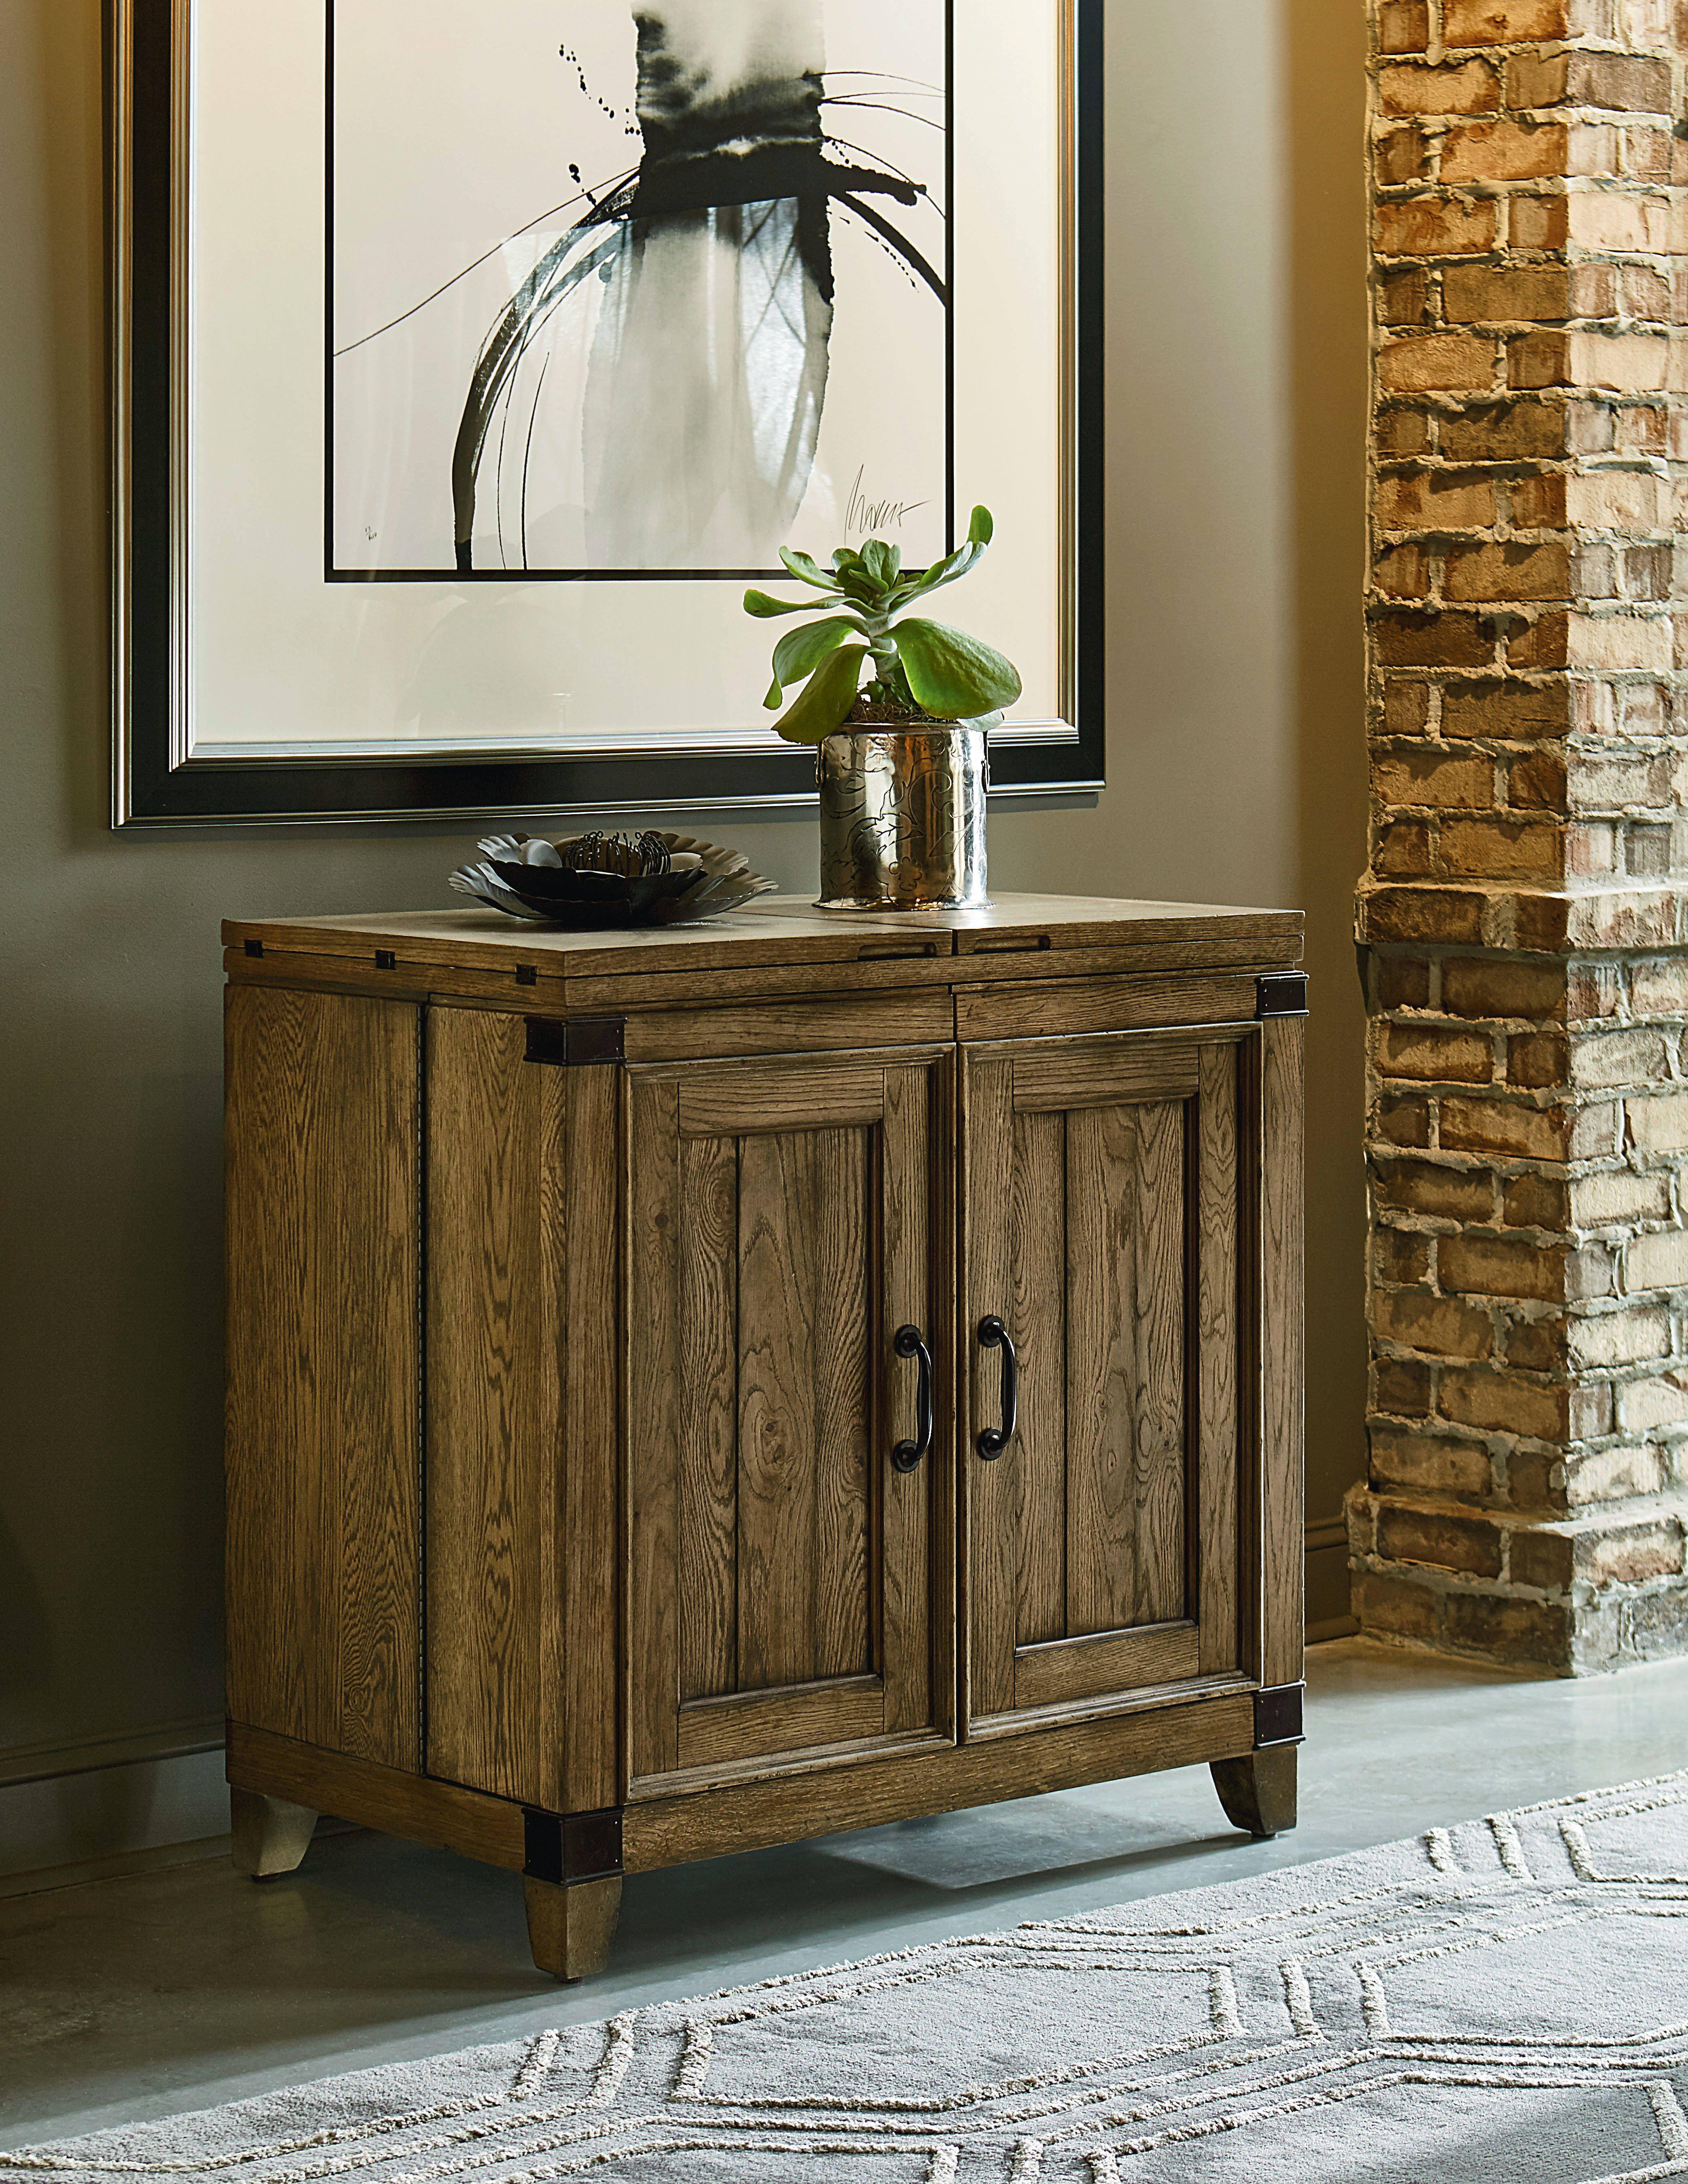 Metalworks Chic Hardwood Solid Two Doors Bar Cabinet